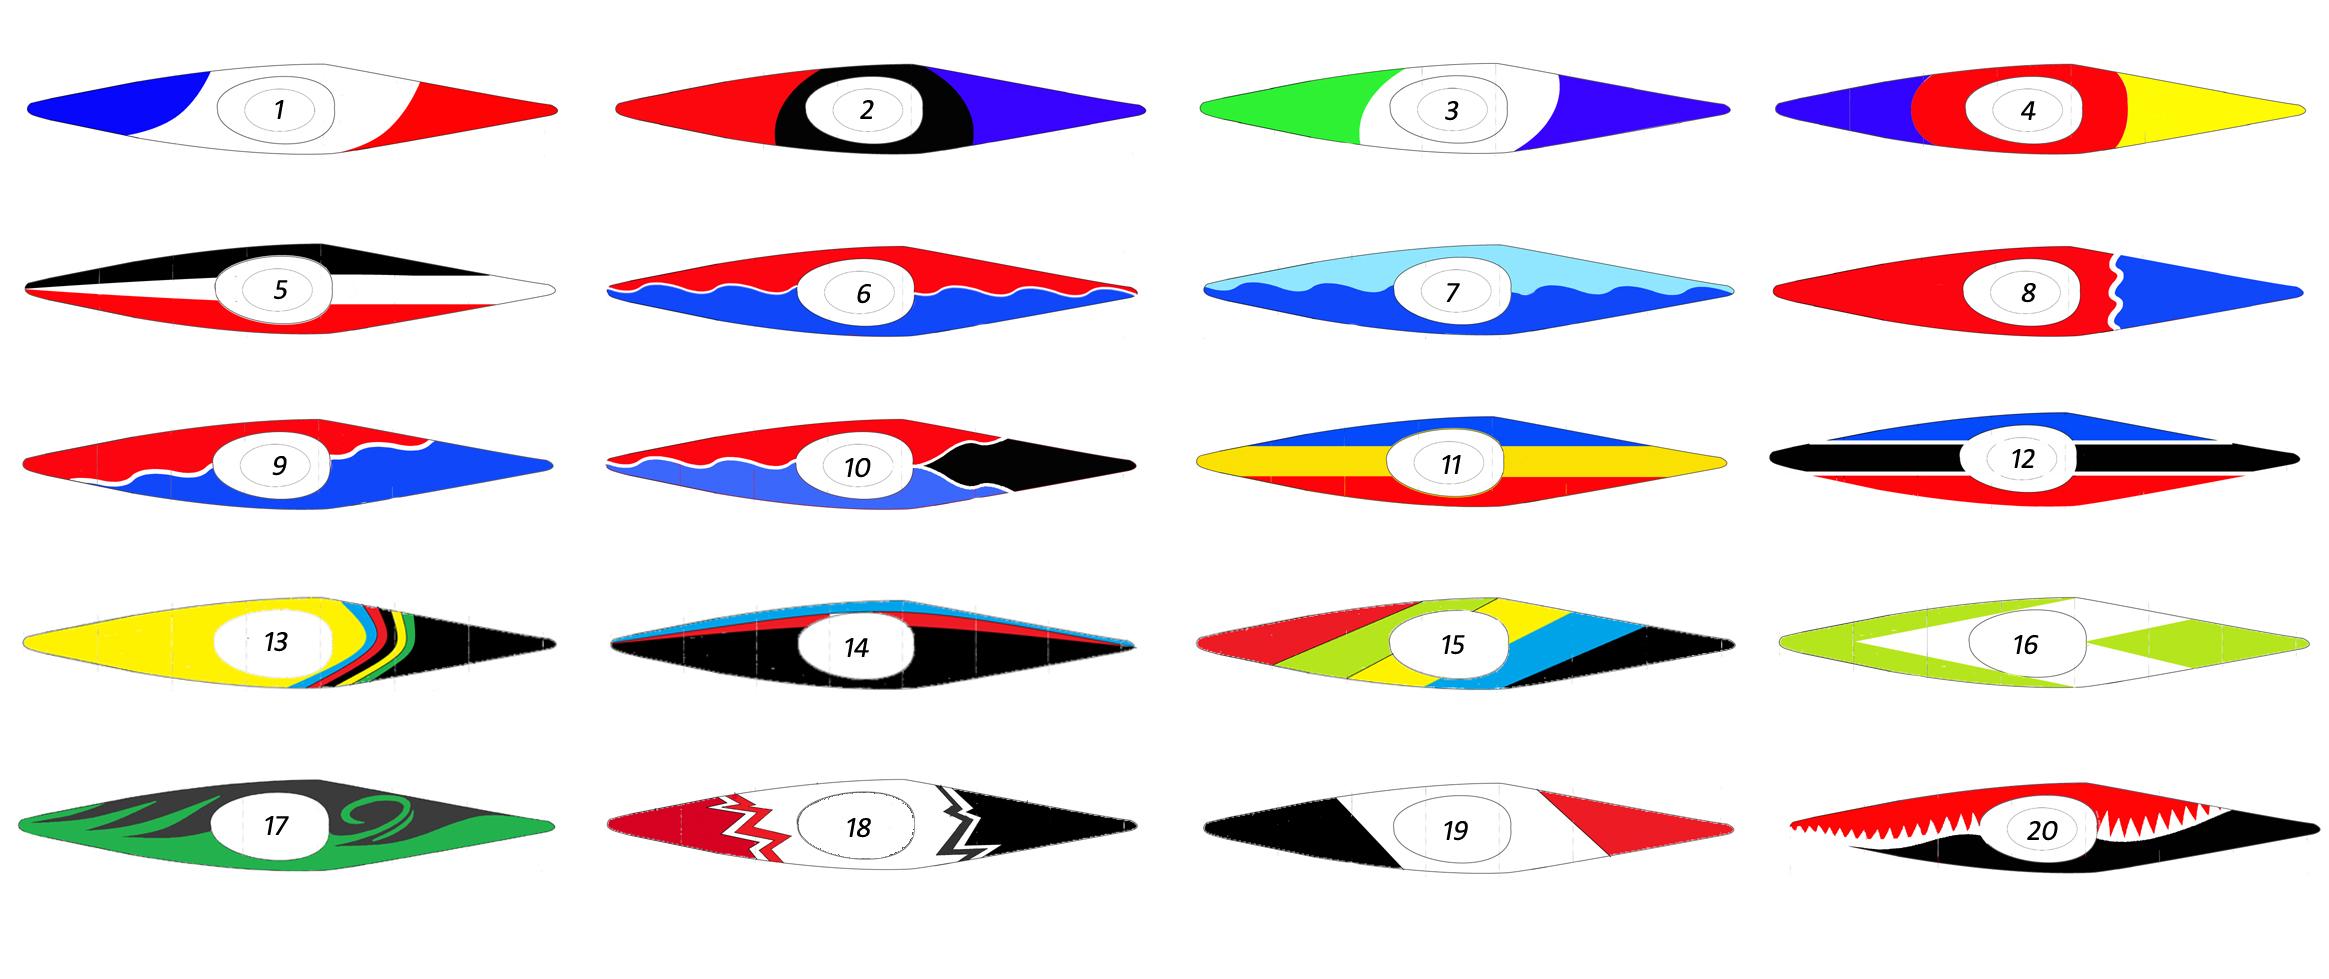 Designideen Kanuslalom K1 C1 Orbit Racing